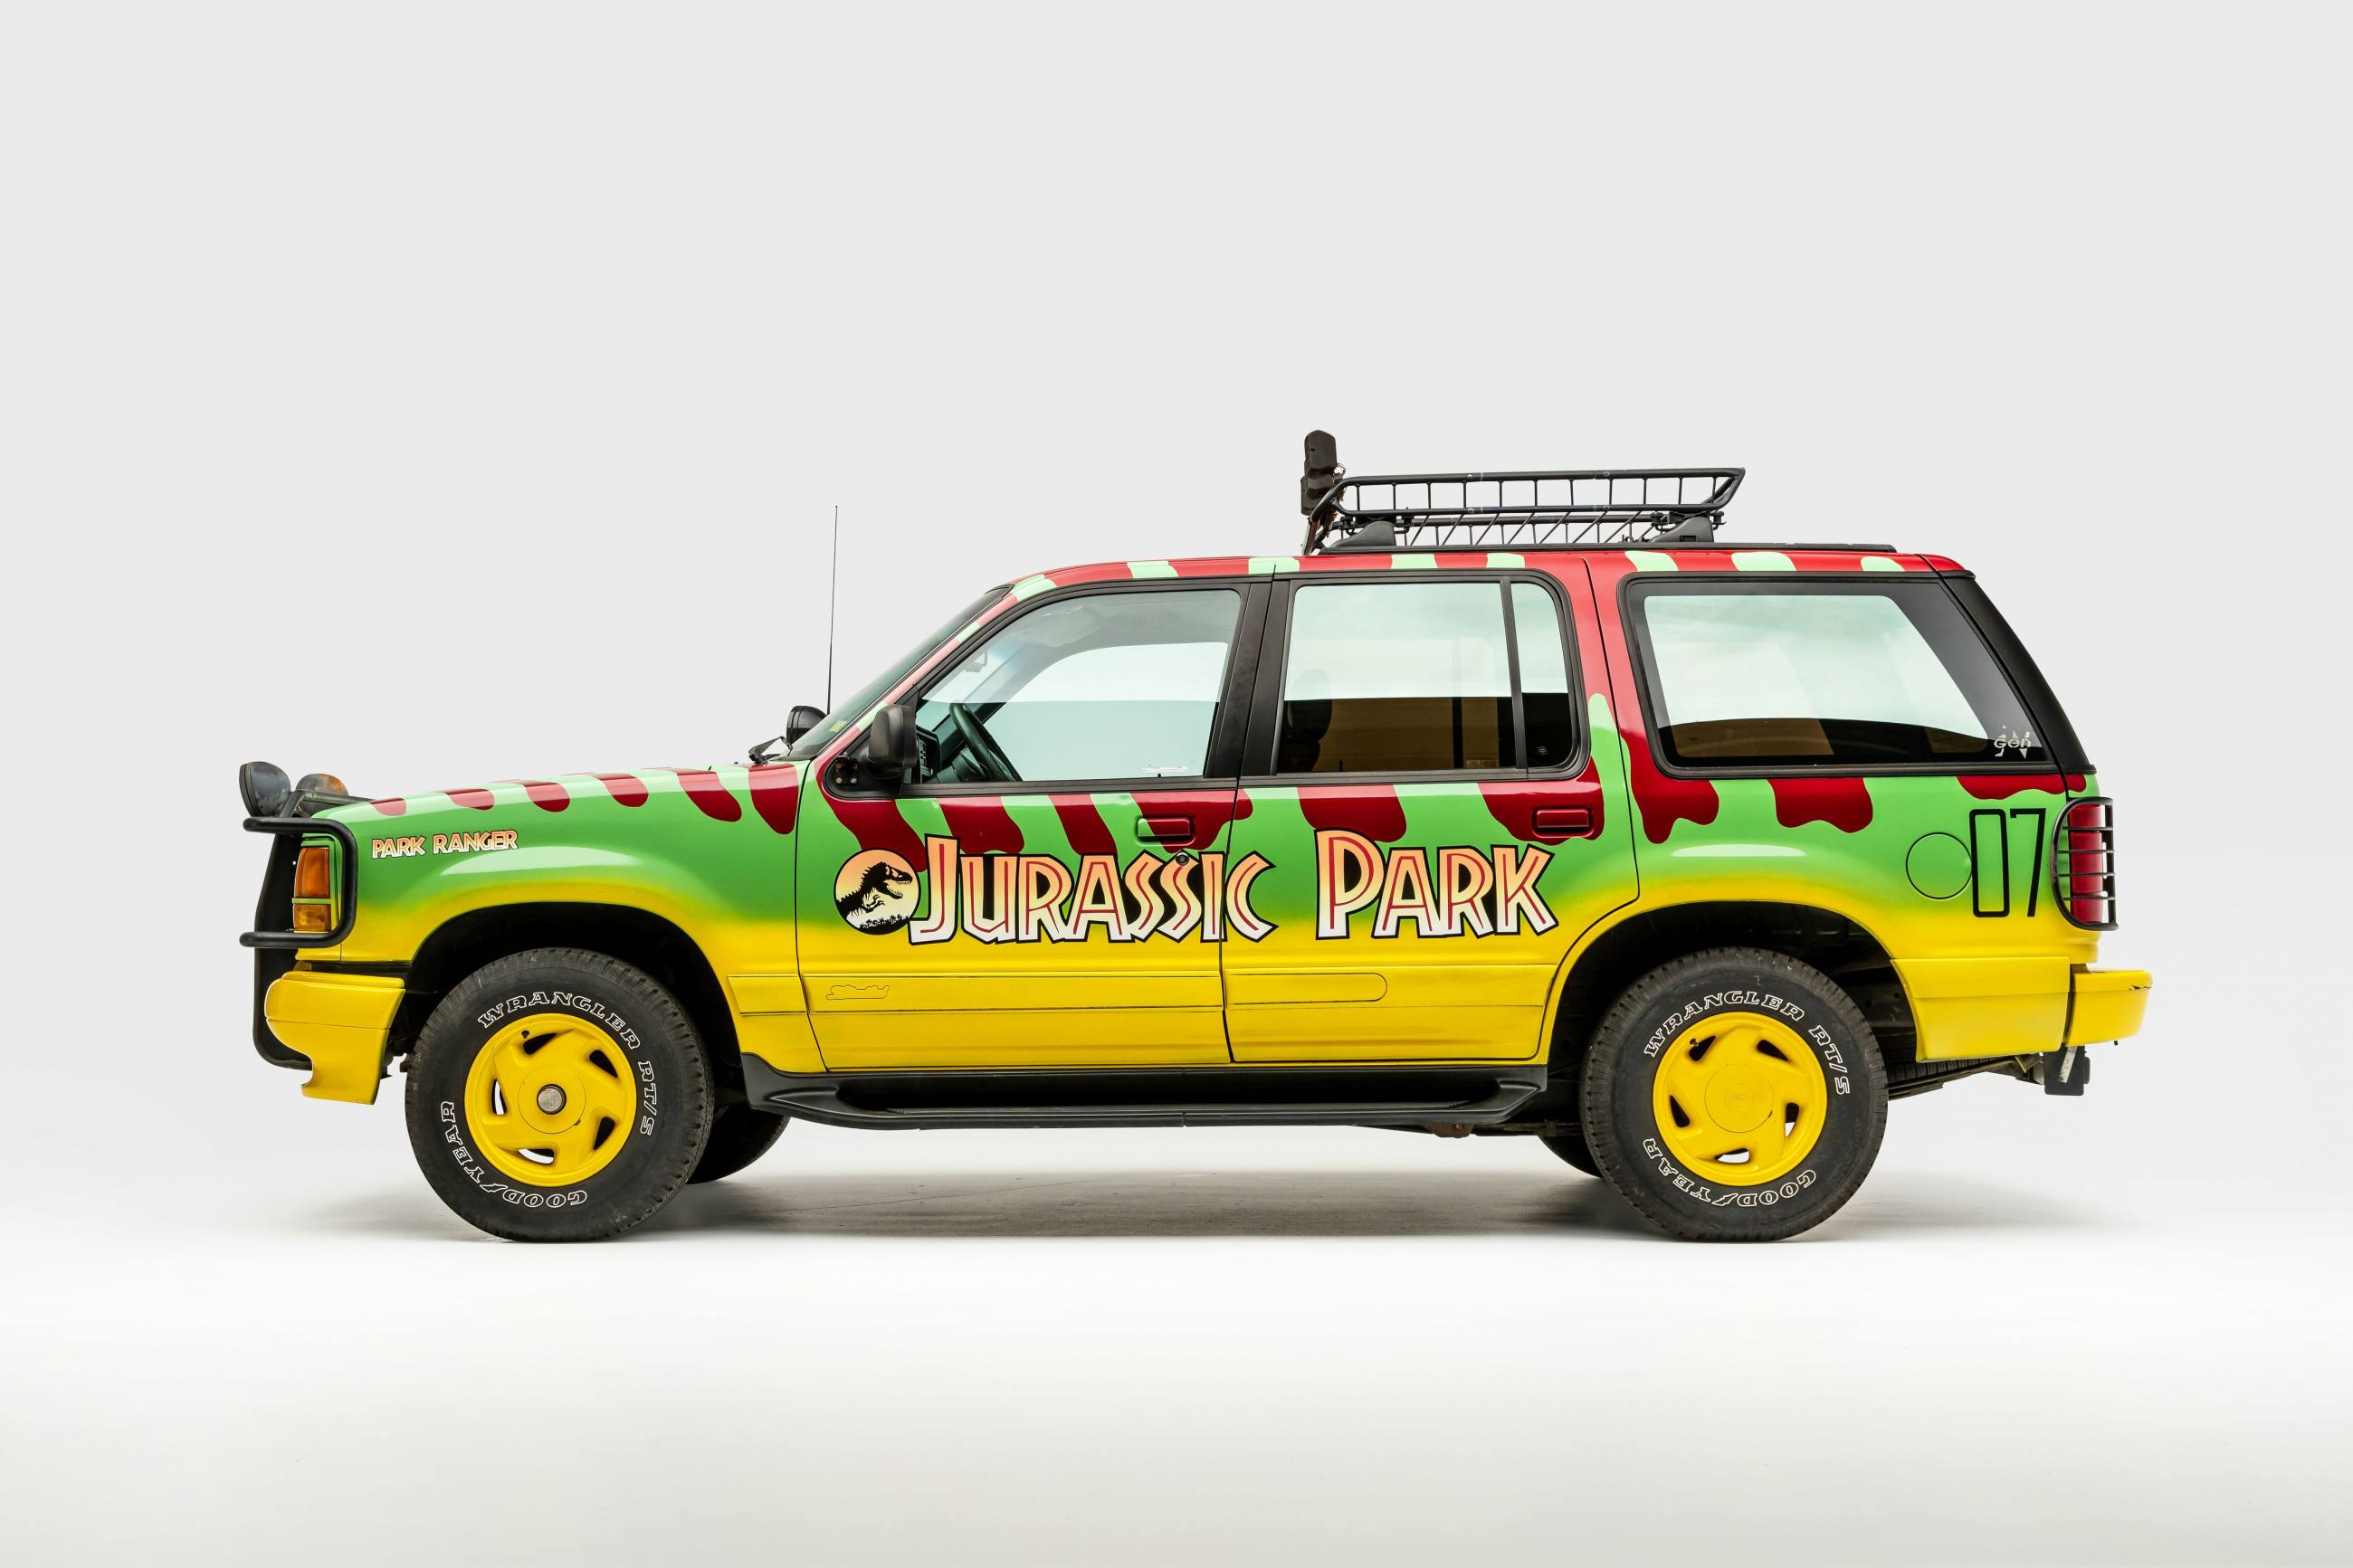 Replica of Ford Explorer XLT Tour Vehicle #07 from Jurassic Park (1993)   Photo: Petersen Automotive Museum